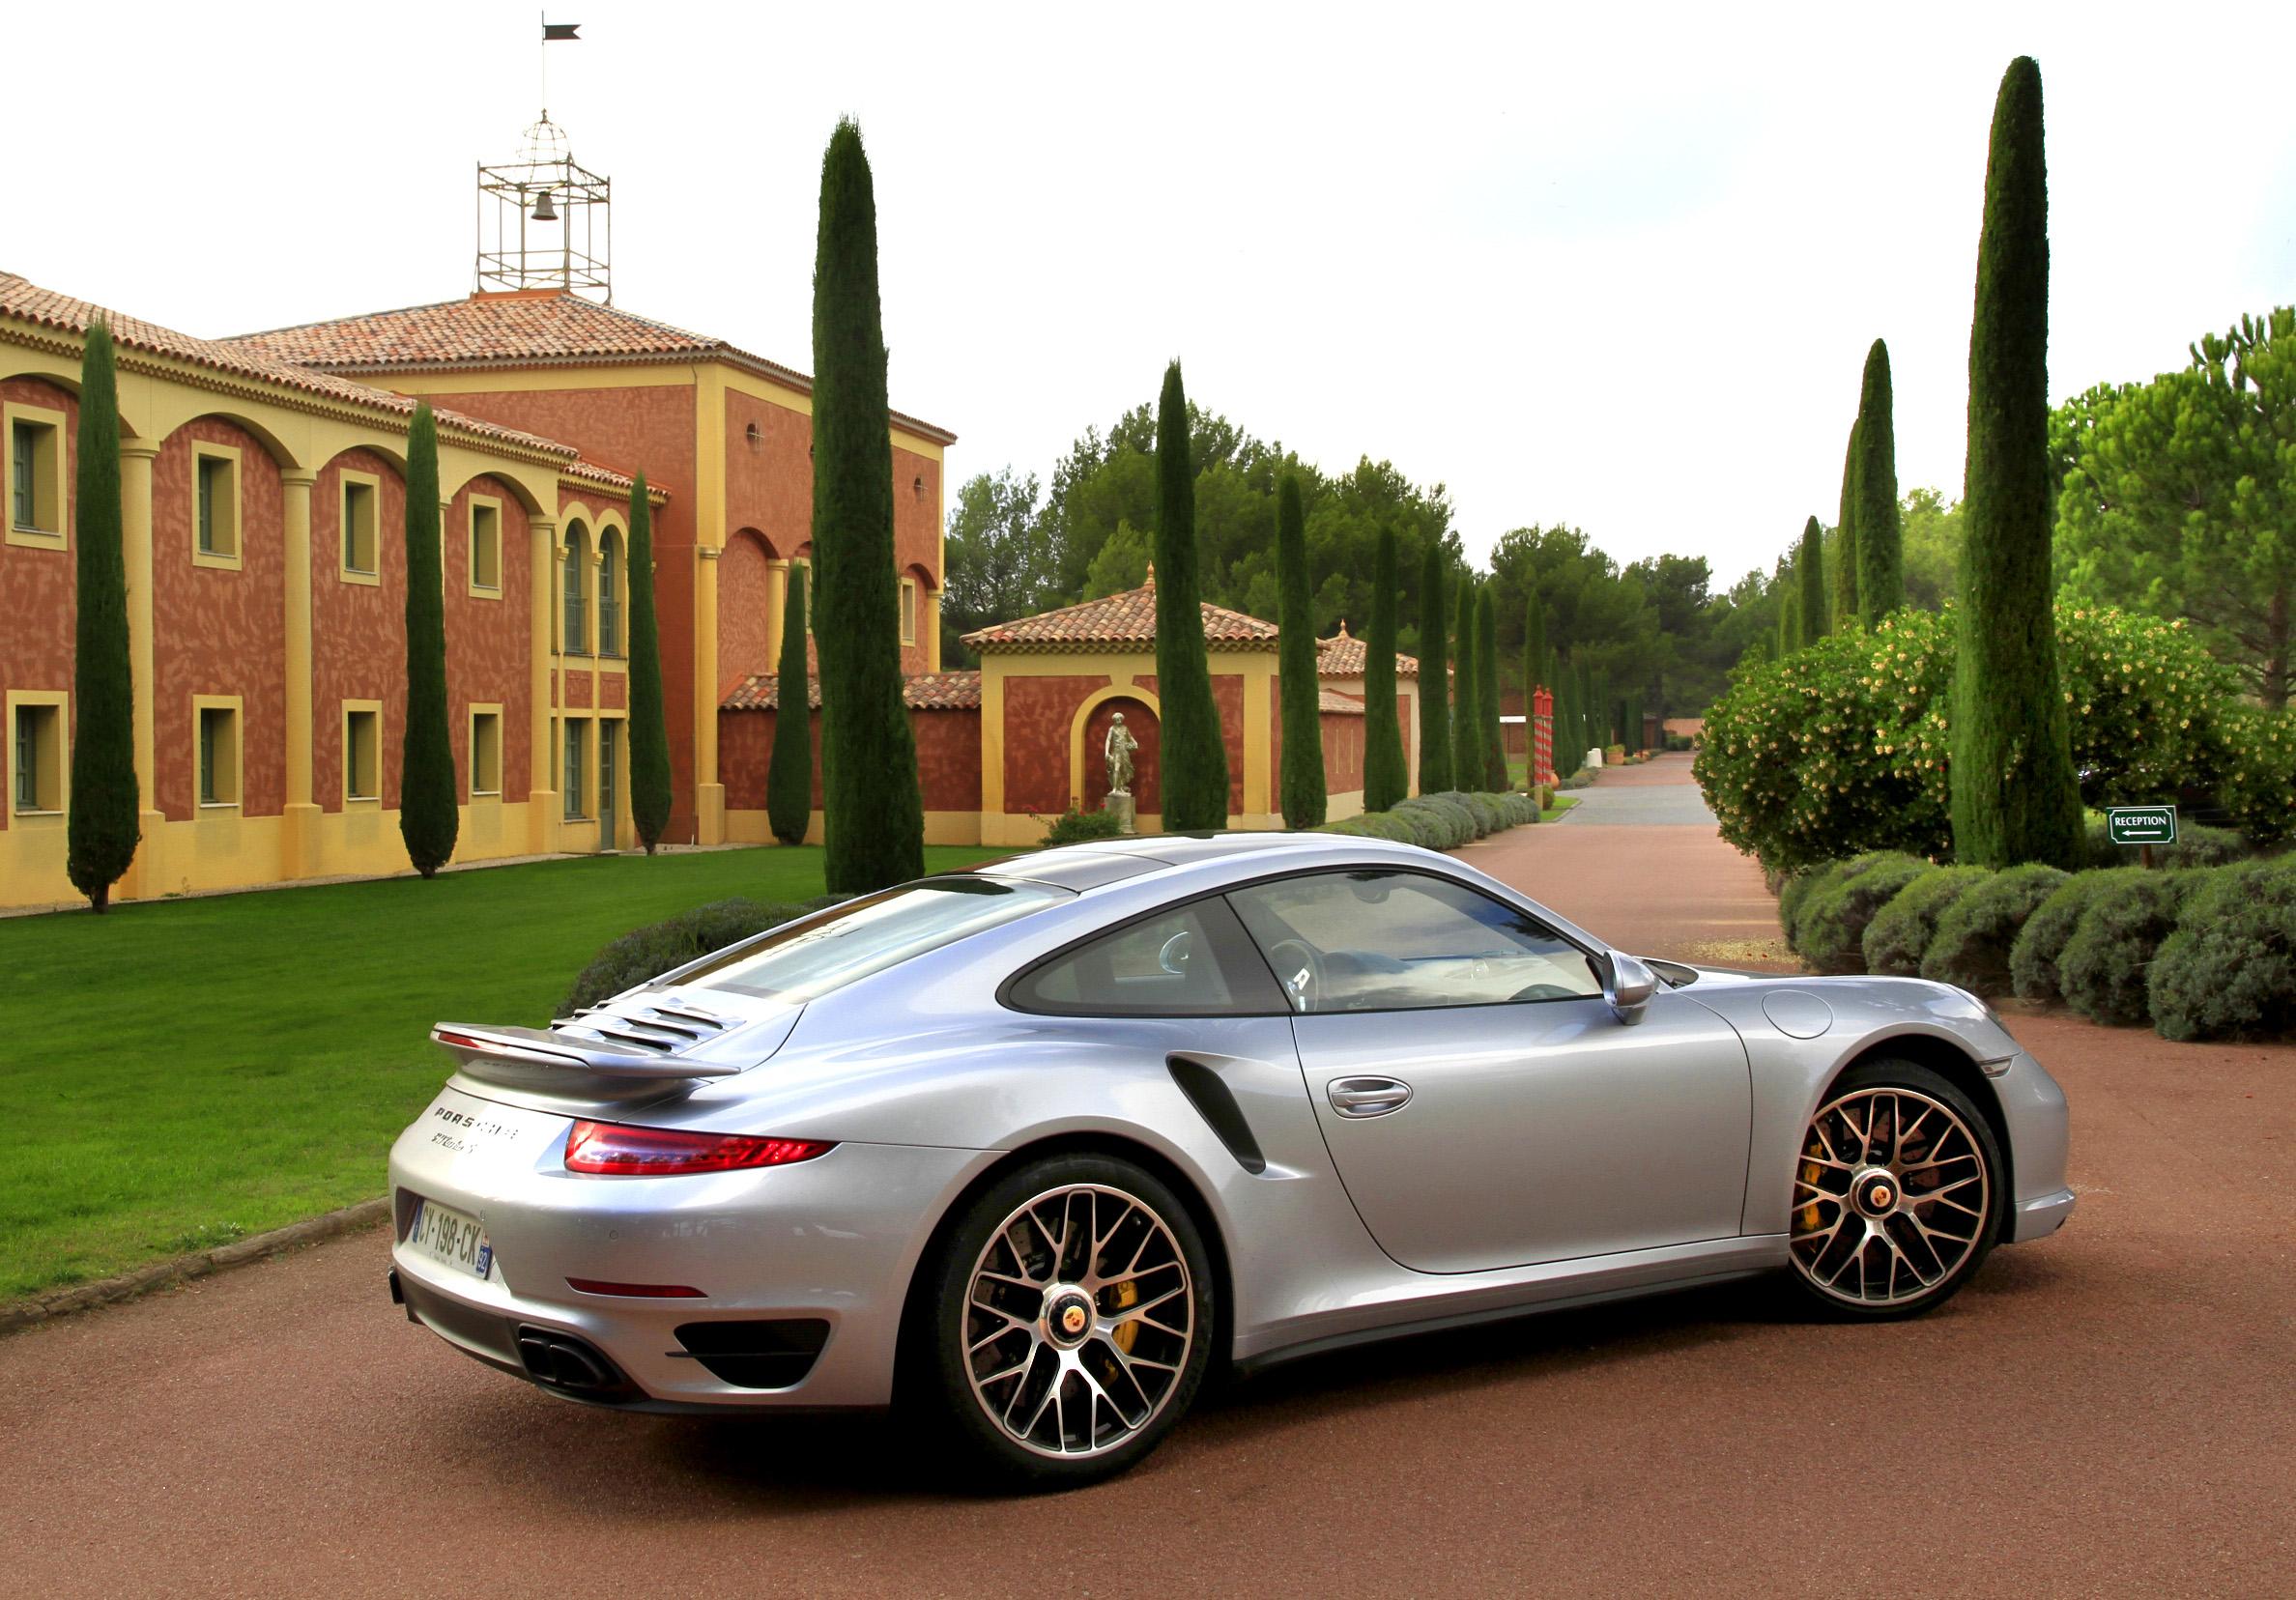 http://images.caradisiac.com/images/0/1/5/6/90156/S0-Essai-video-Porsche-911-Turbo-S-la-bete-domestiquee-306363.jpg